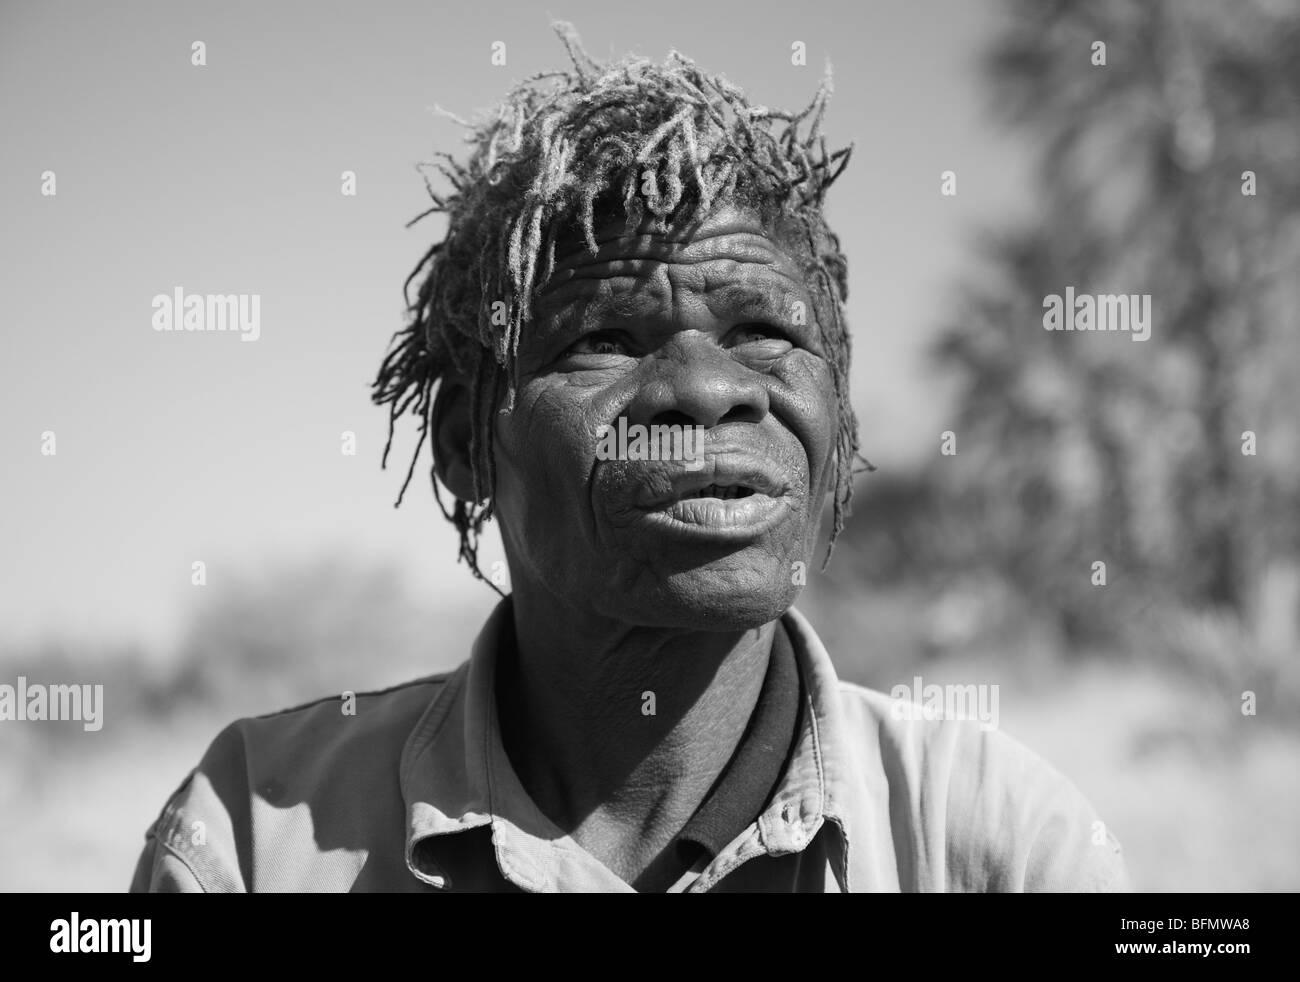 Botswana, Makgadikgadi, Jack's Camp. A portrait of an old Bushman guide. - Stock Image